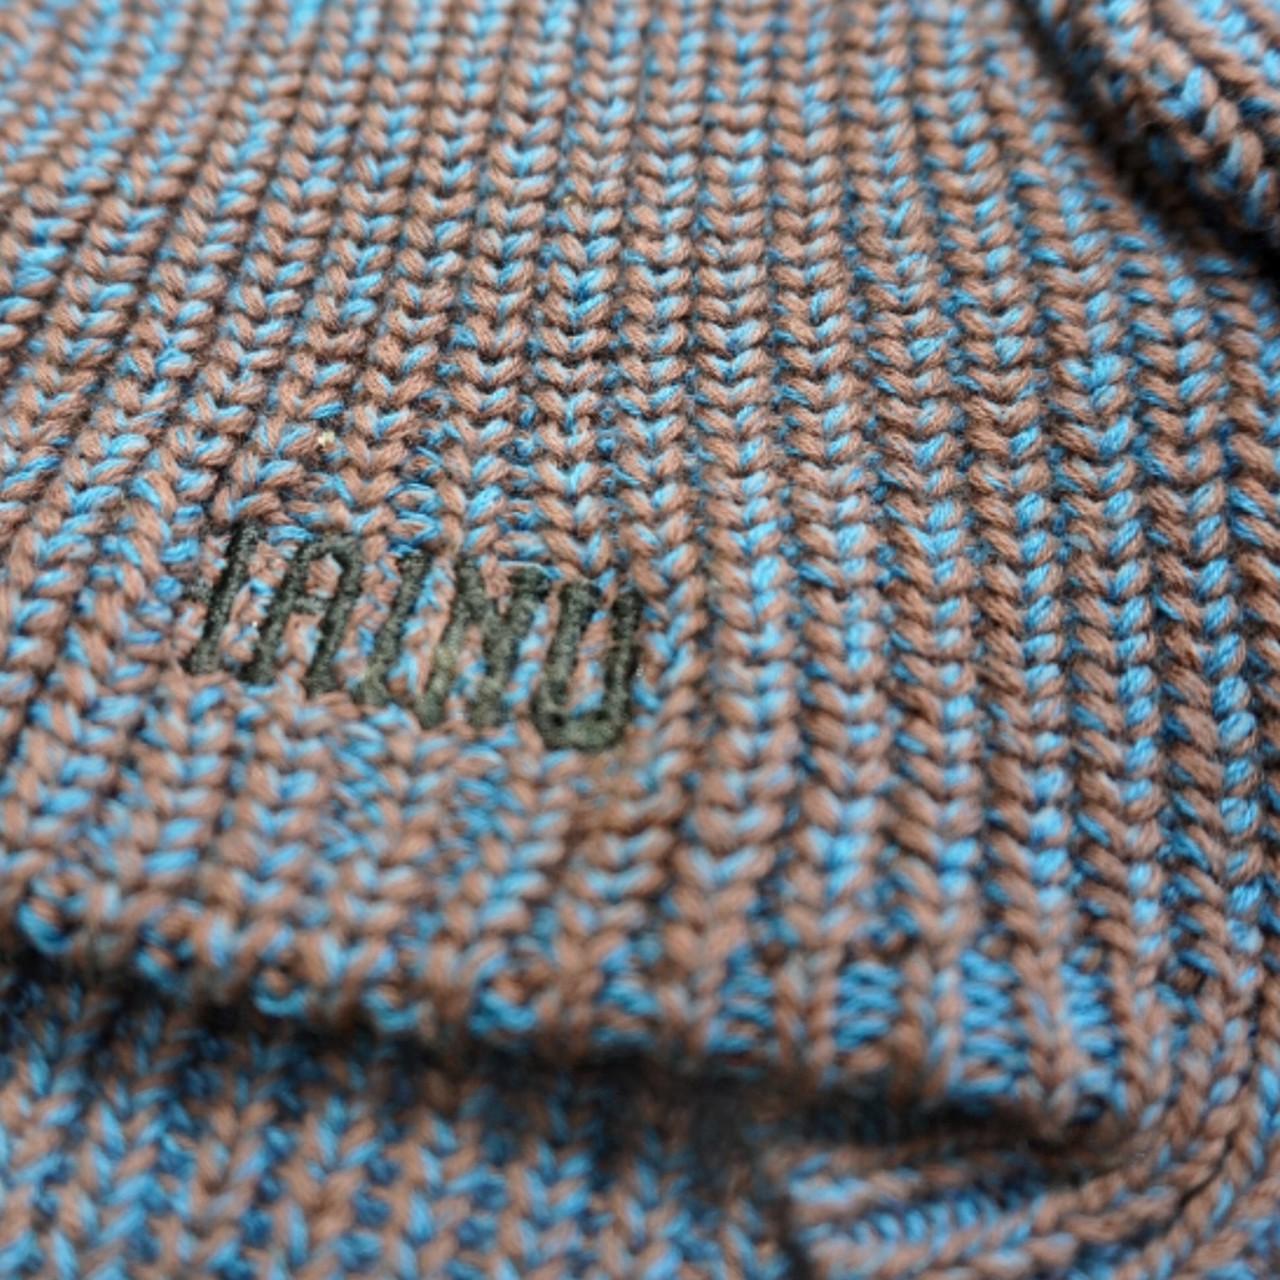 【予約商品】MIX COTTON SWEATER - BLUE/BROWN